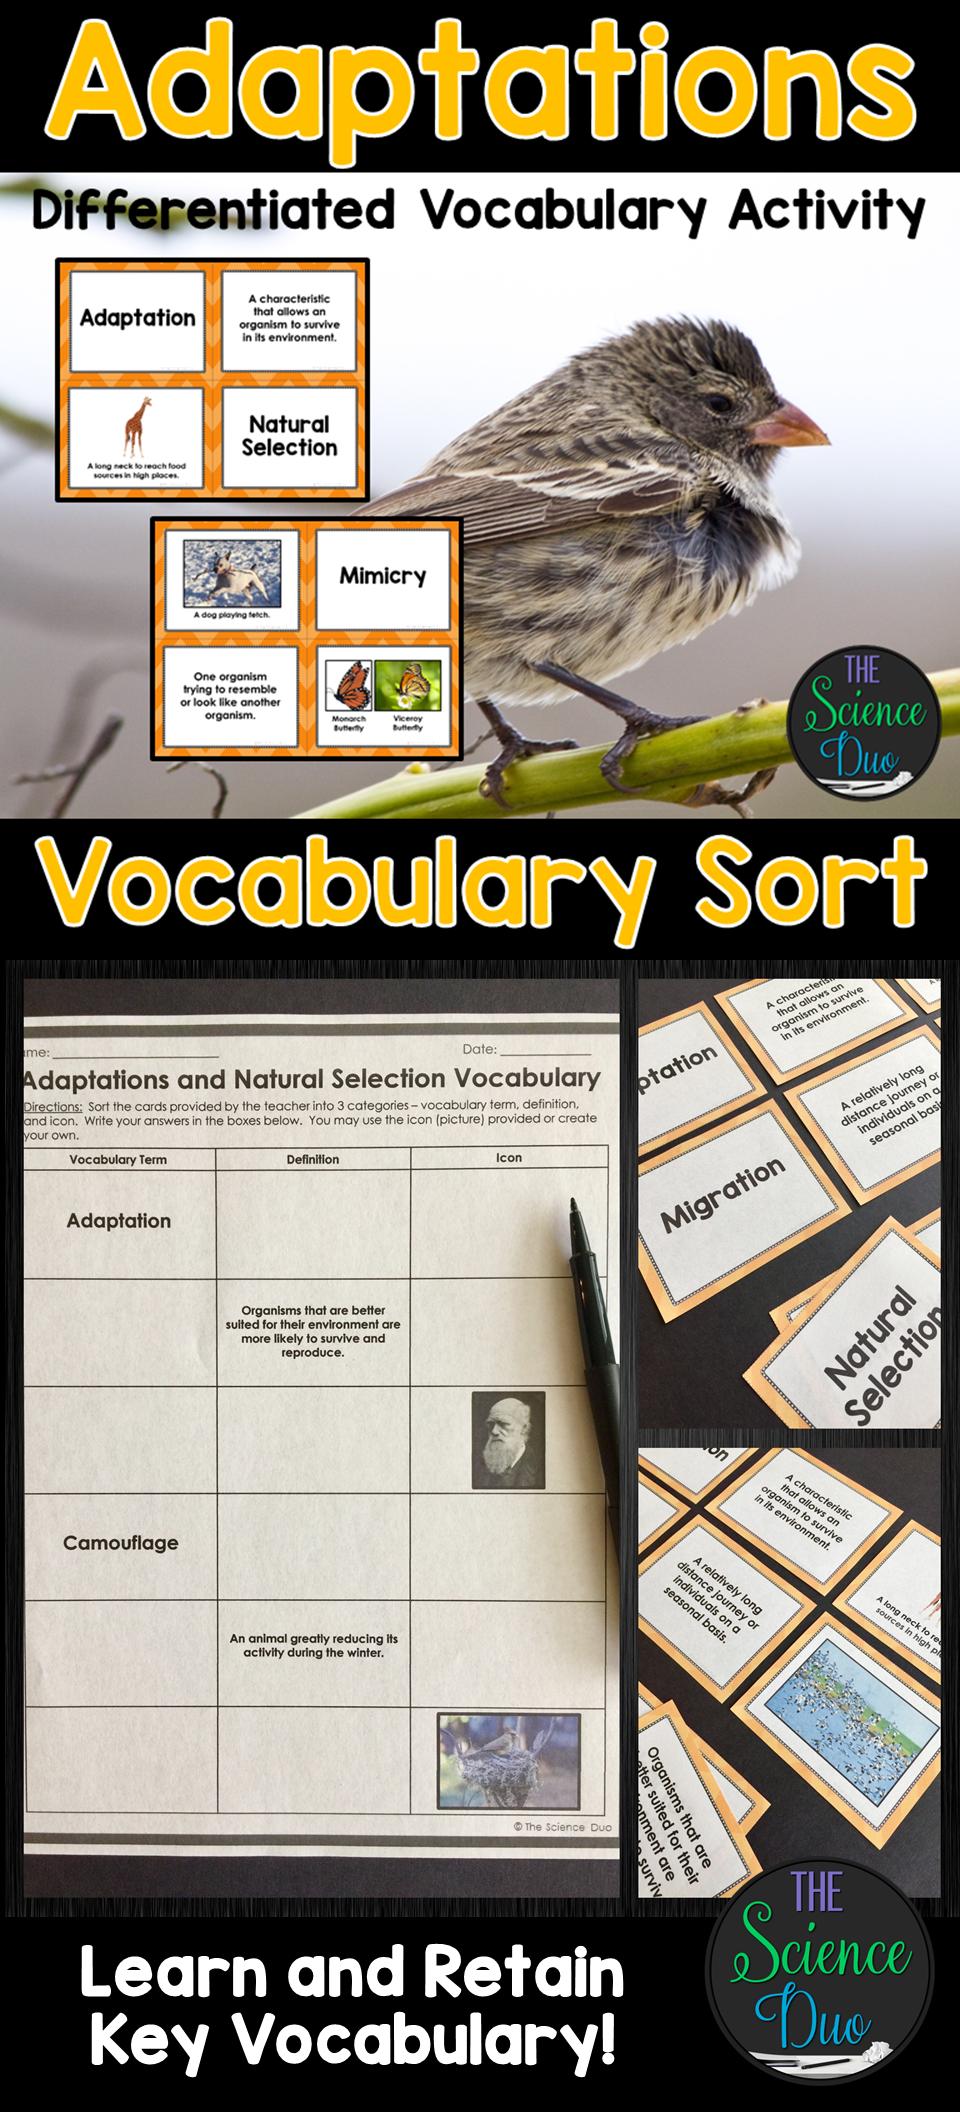 Adaptations and Natural Selection Vocabulary Sort